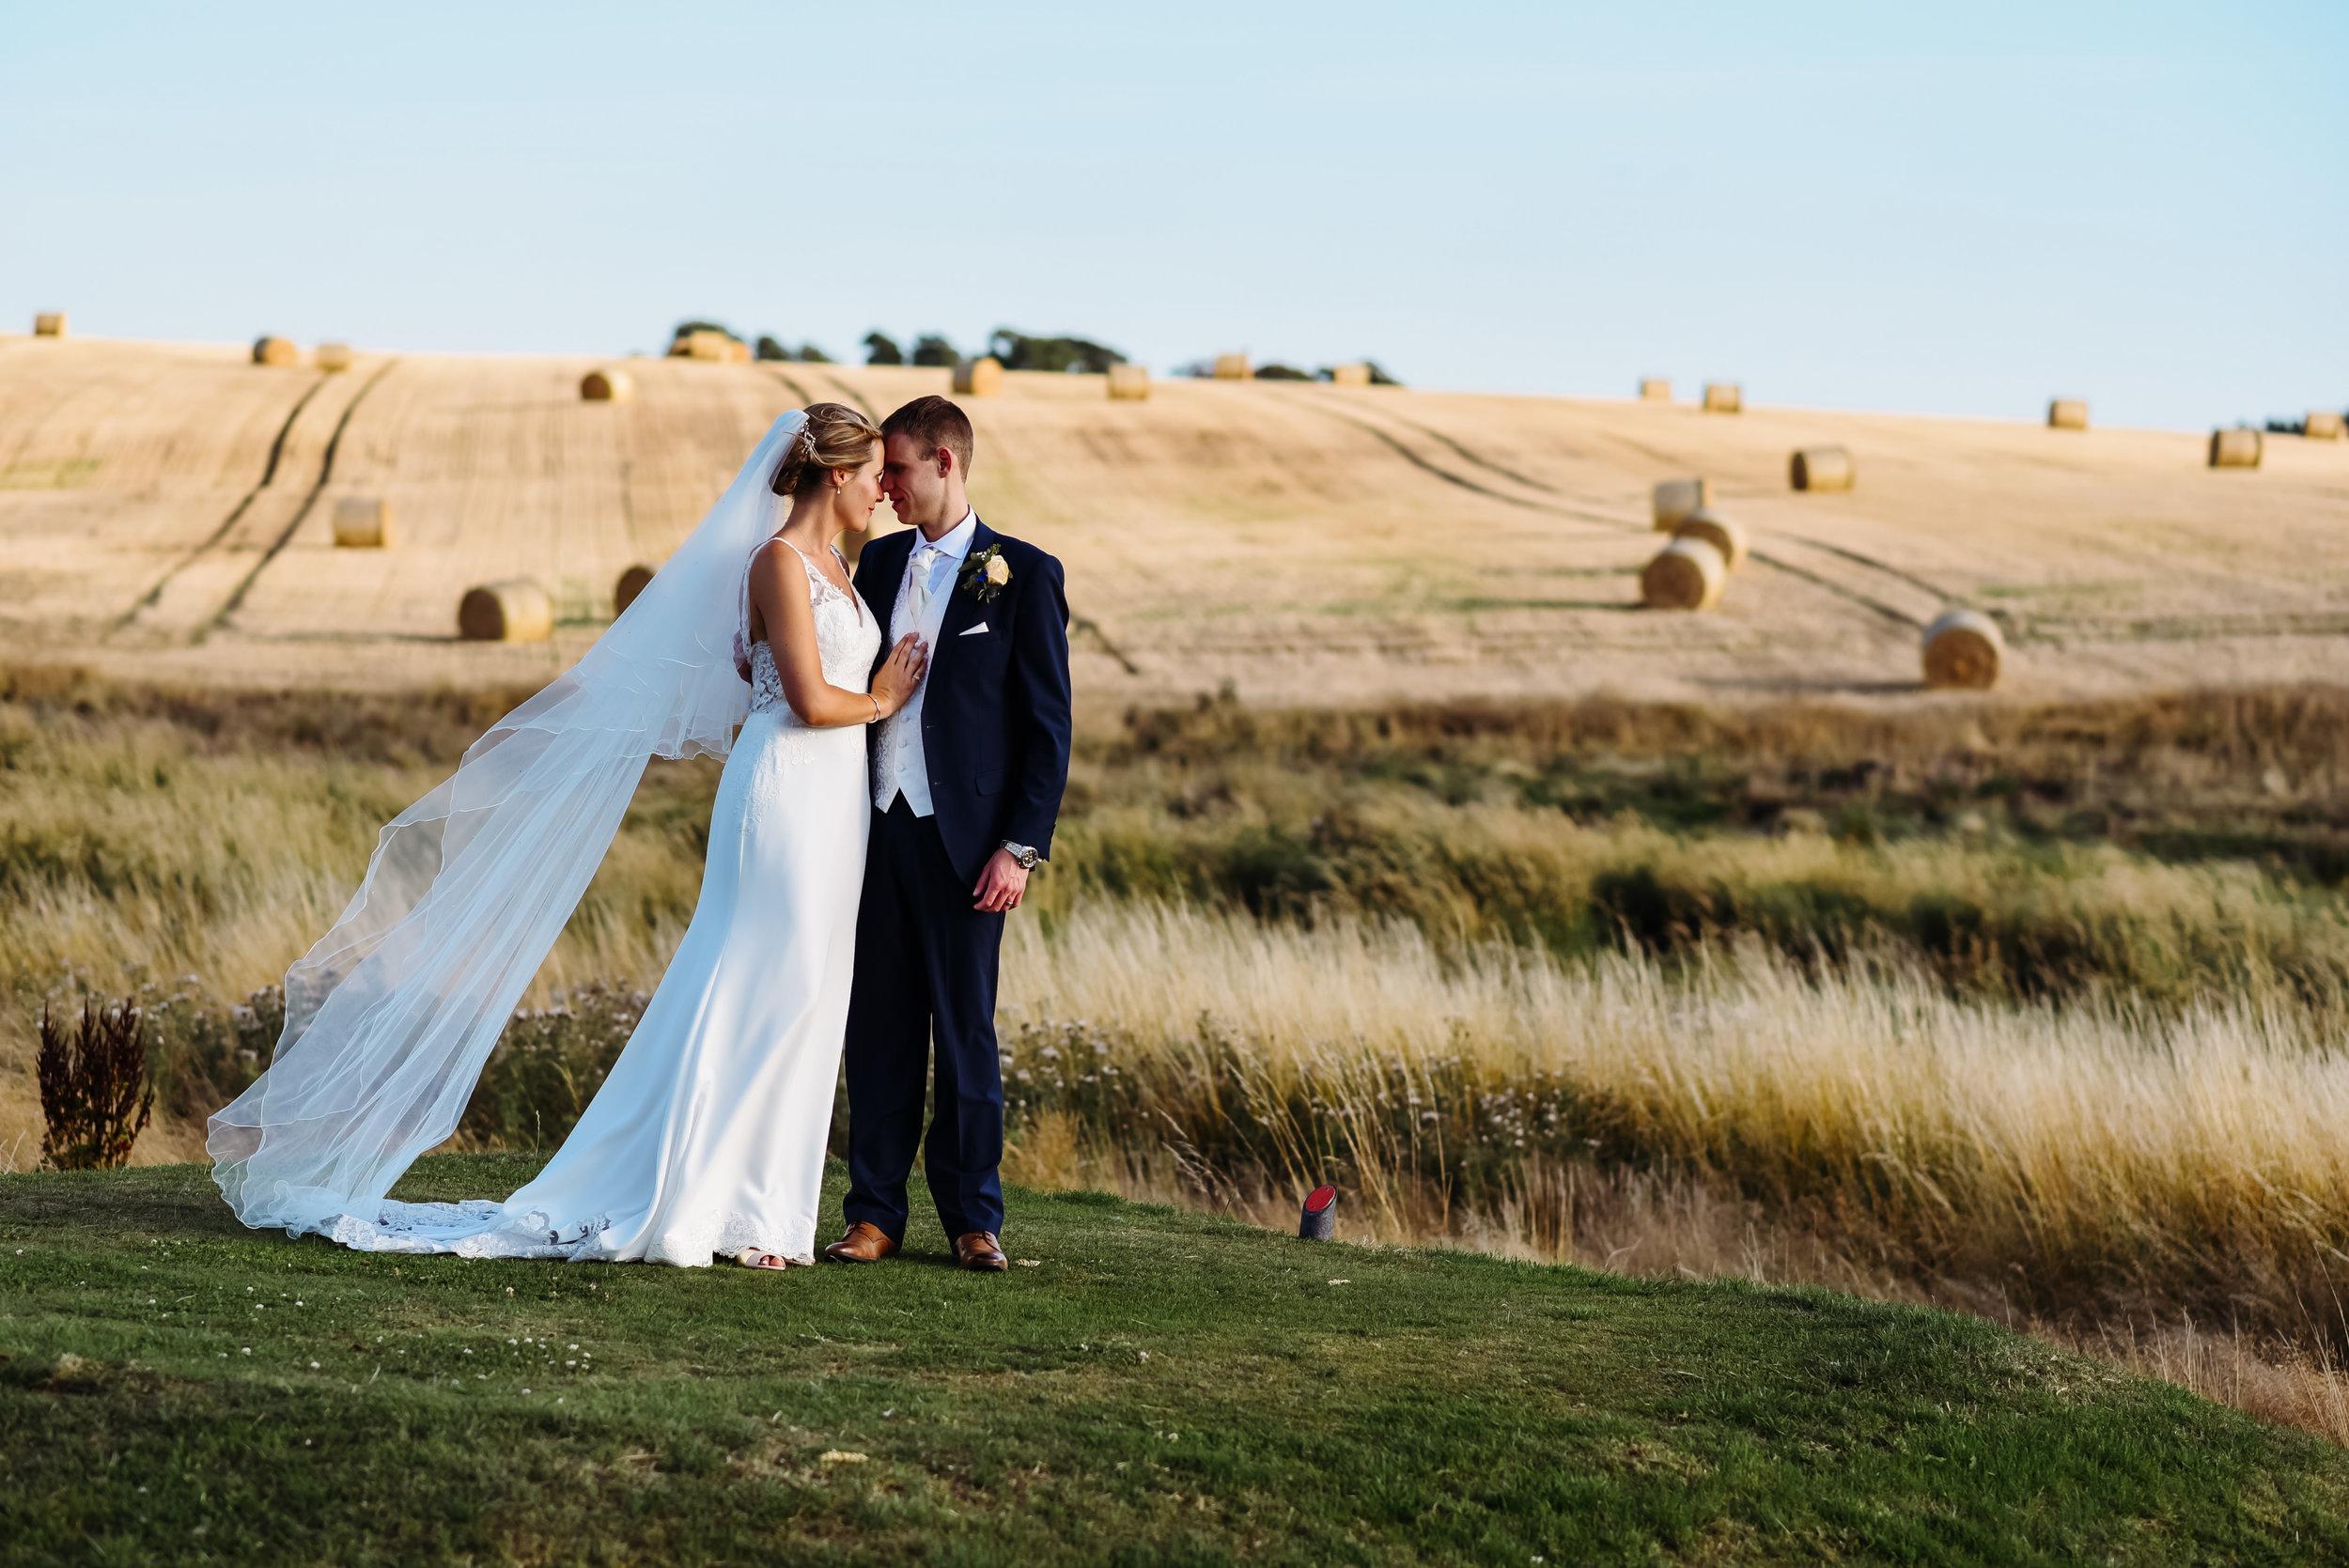 Golf course wedding lancashire